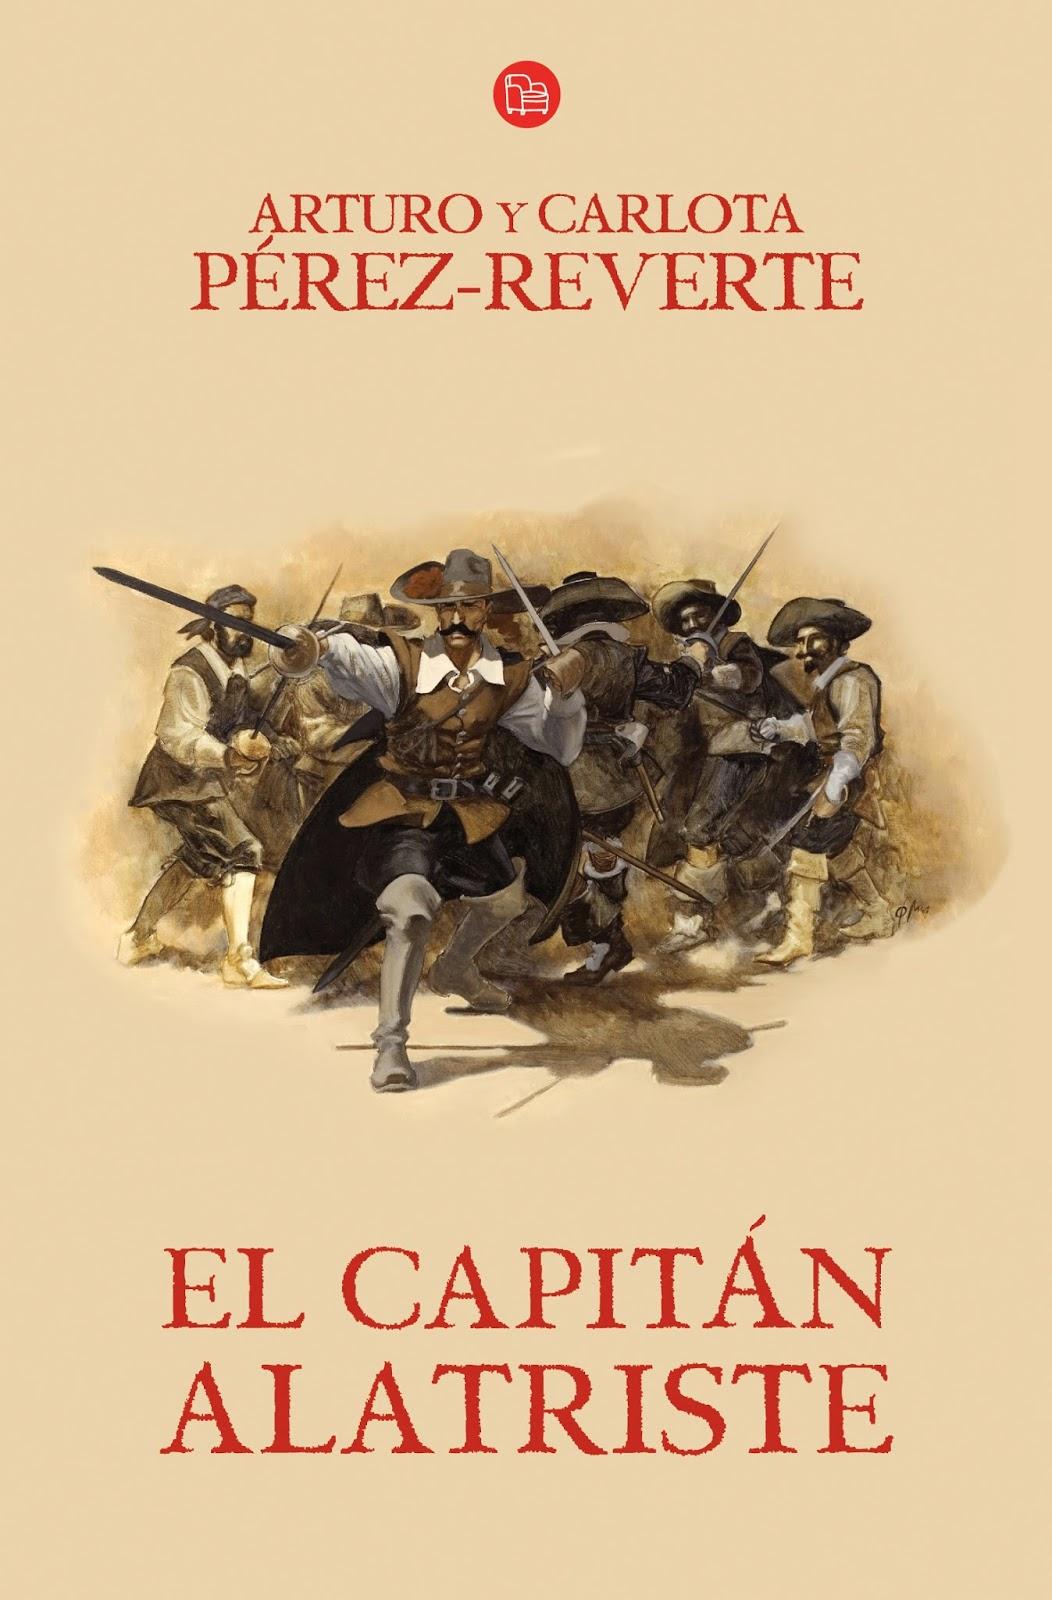 http://leden-des-reves.blogspot.fr/2014/03/el-capitan-alatriste-arturo-perez.html